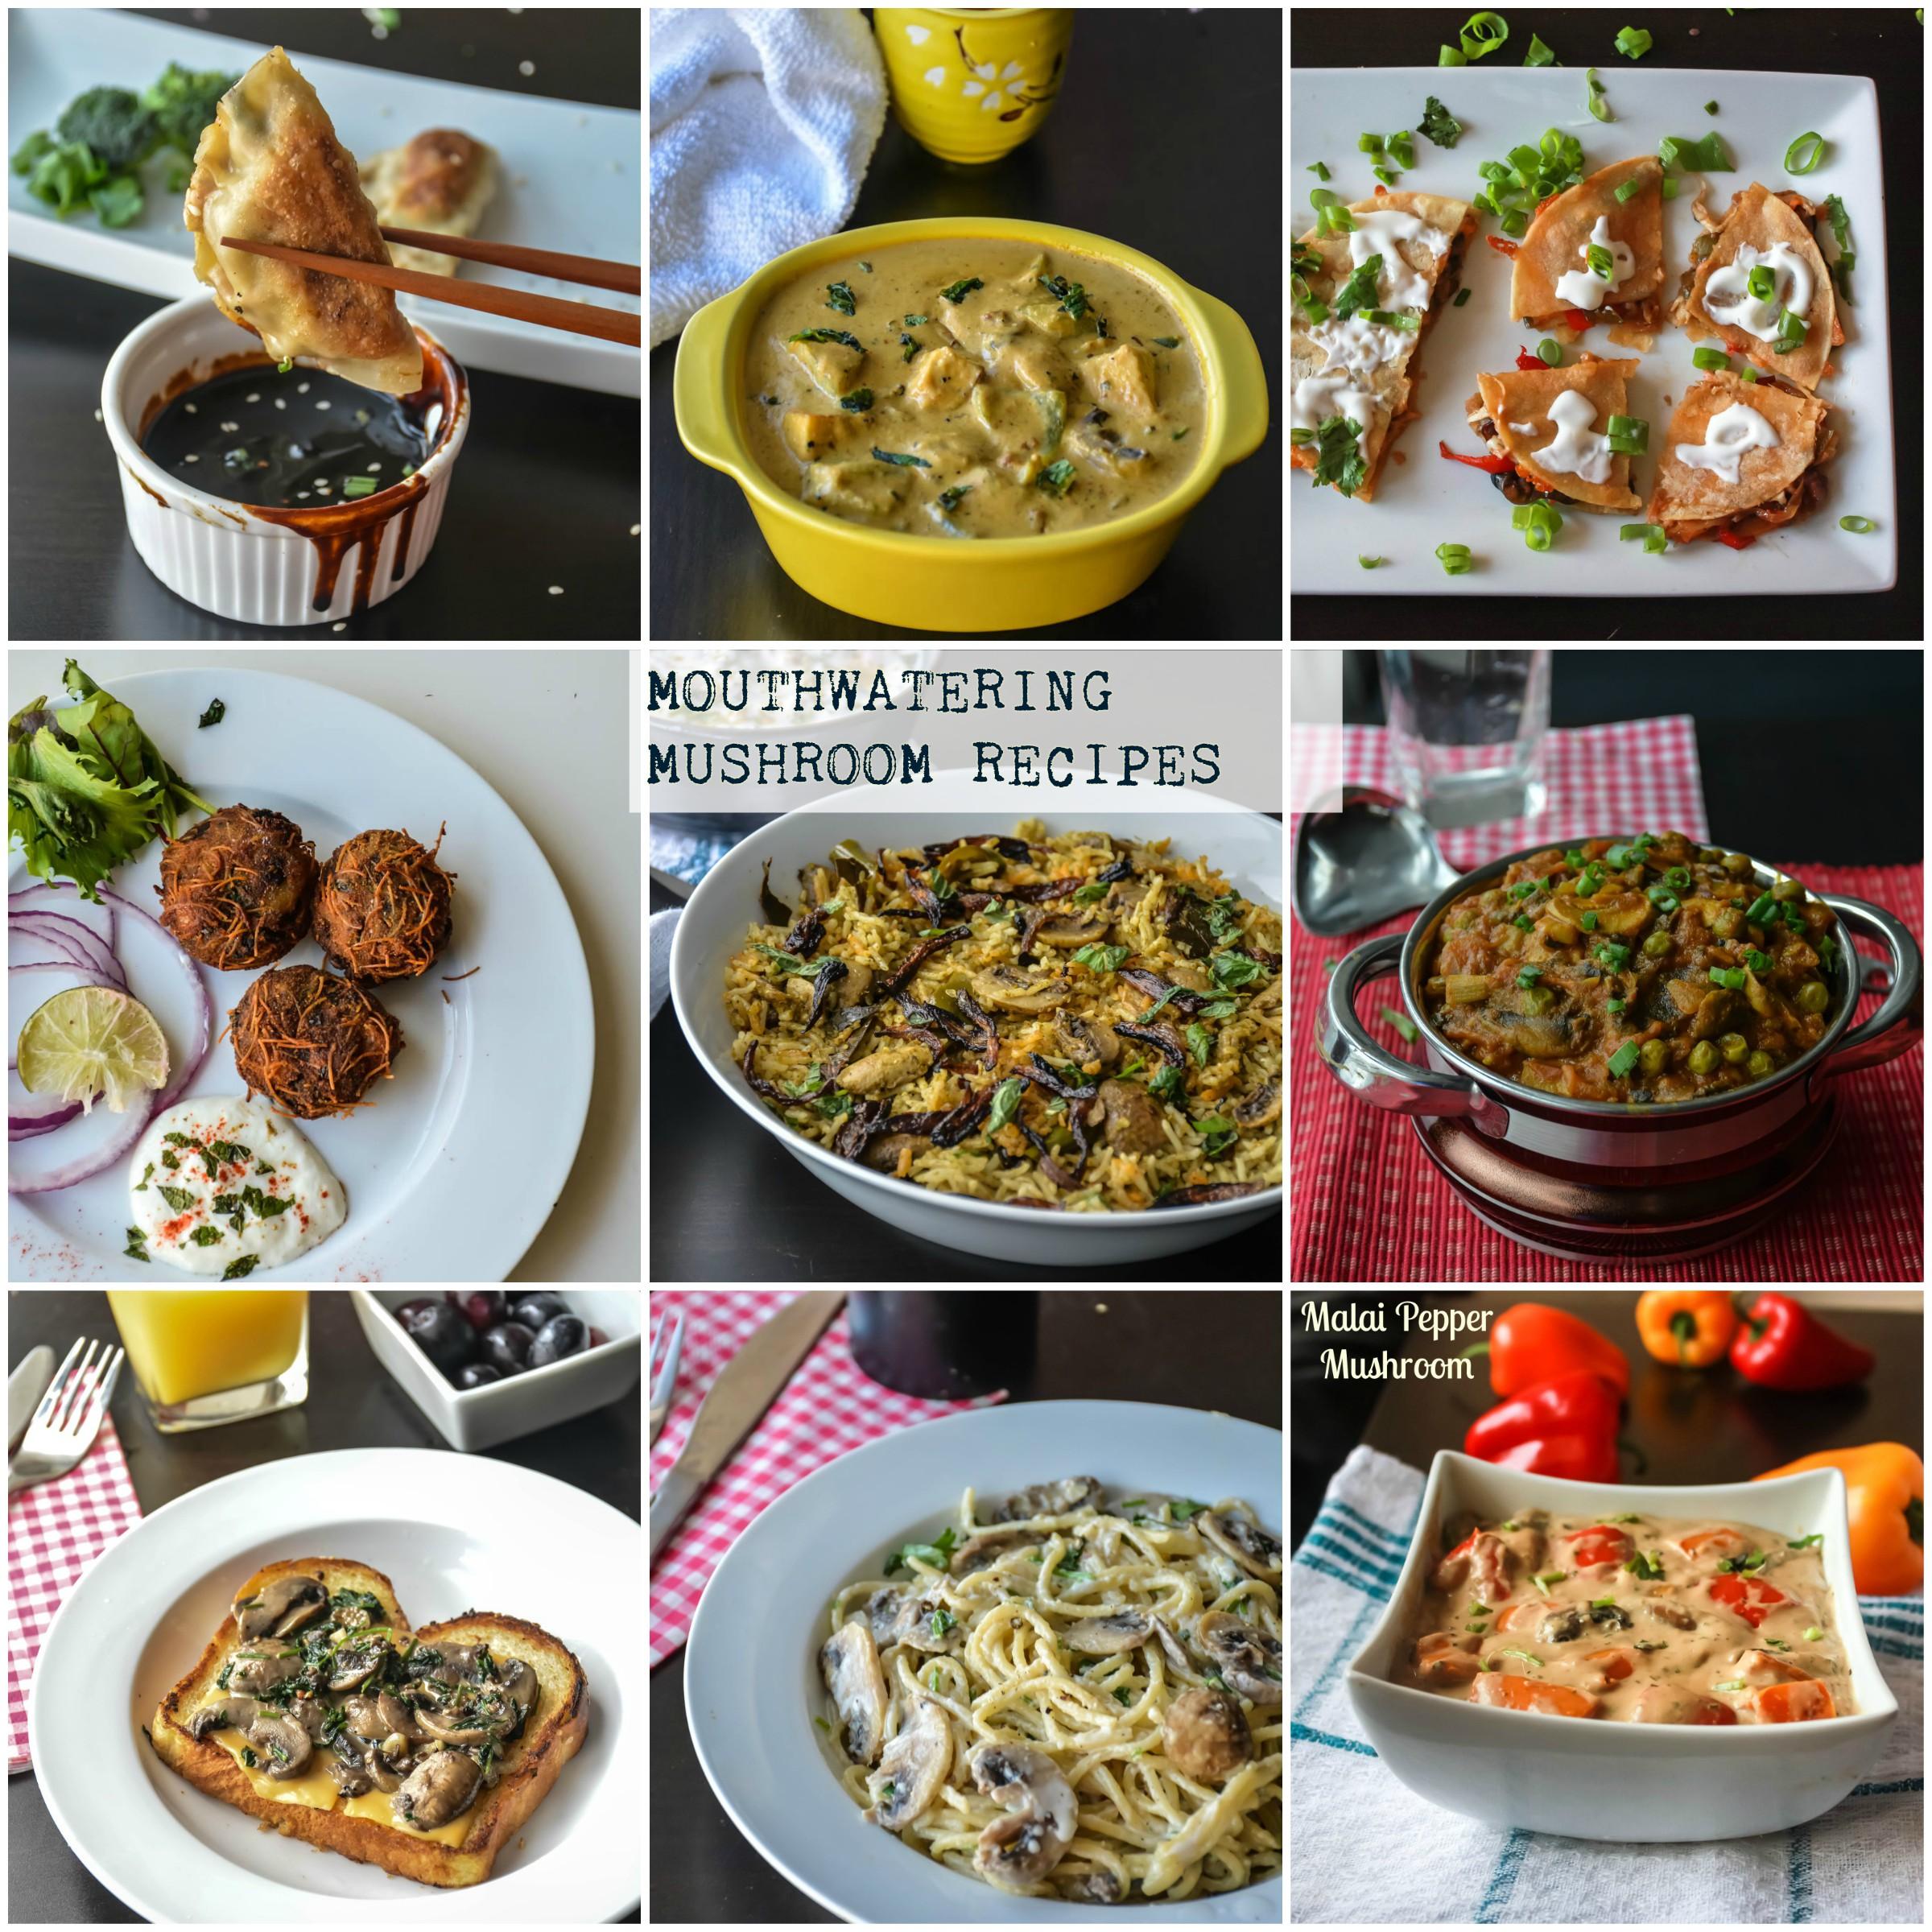 mushroomrecipes